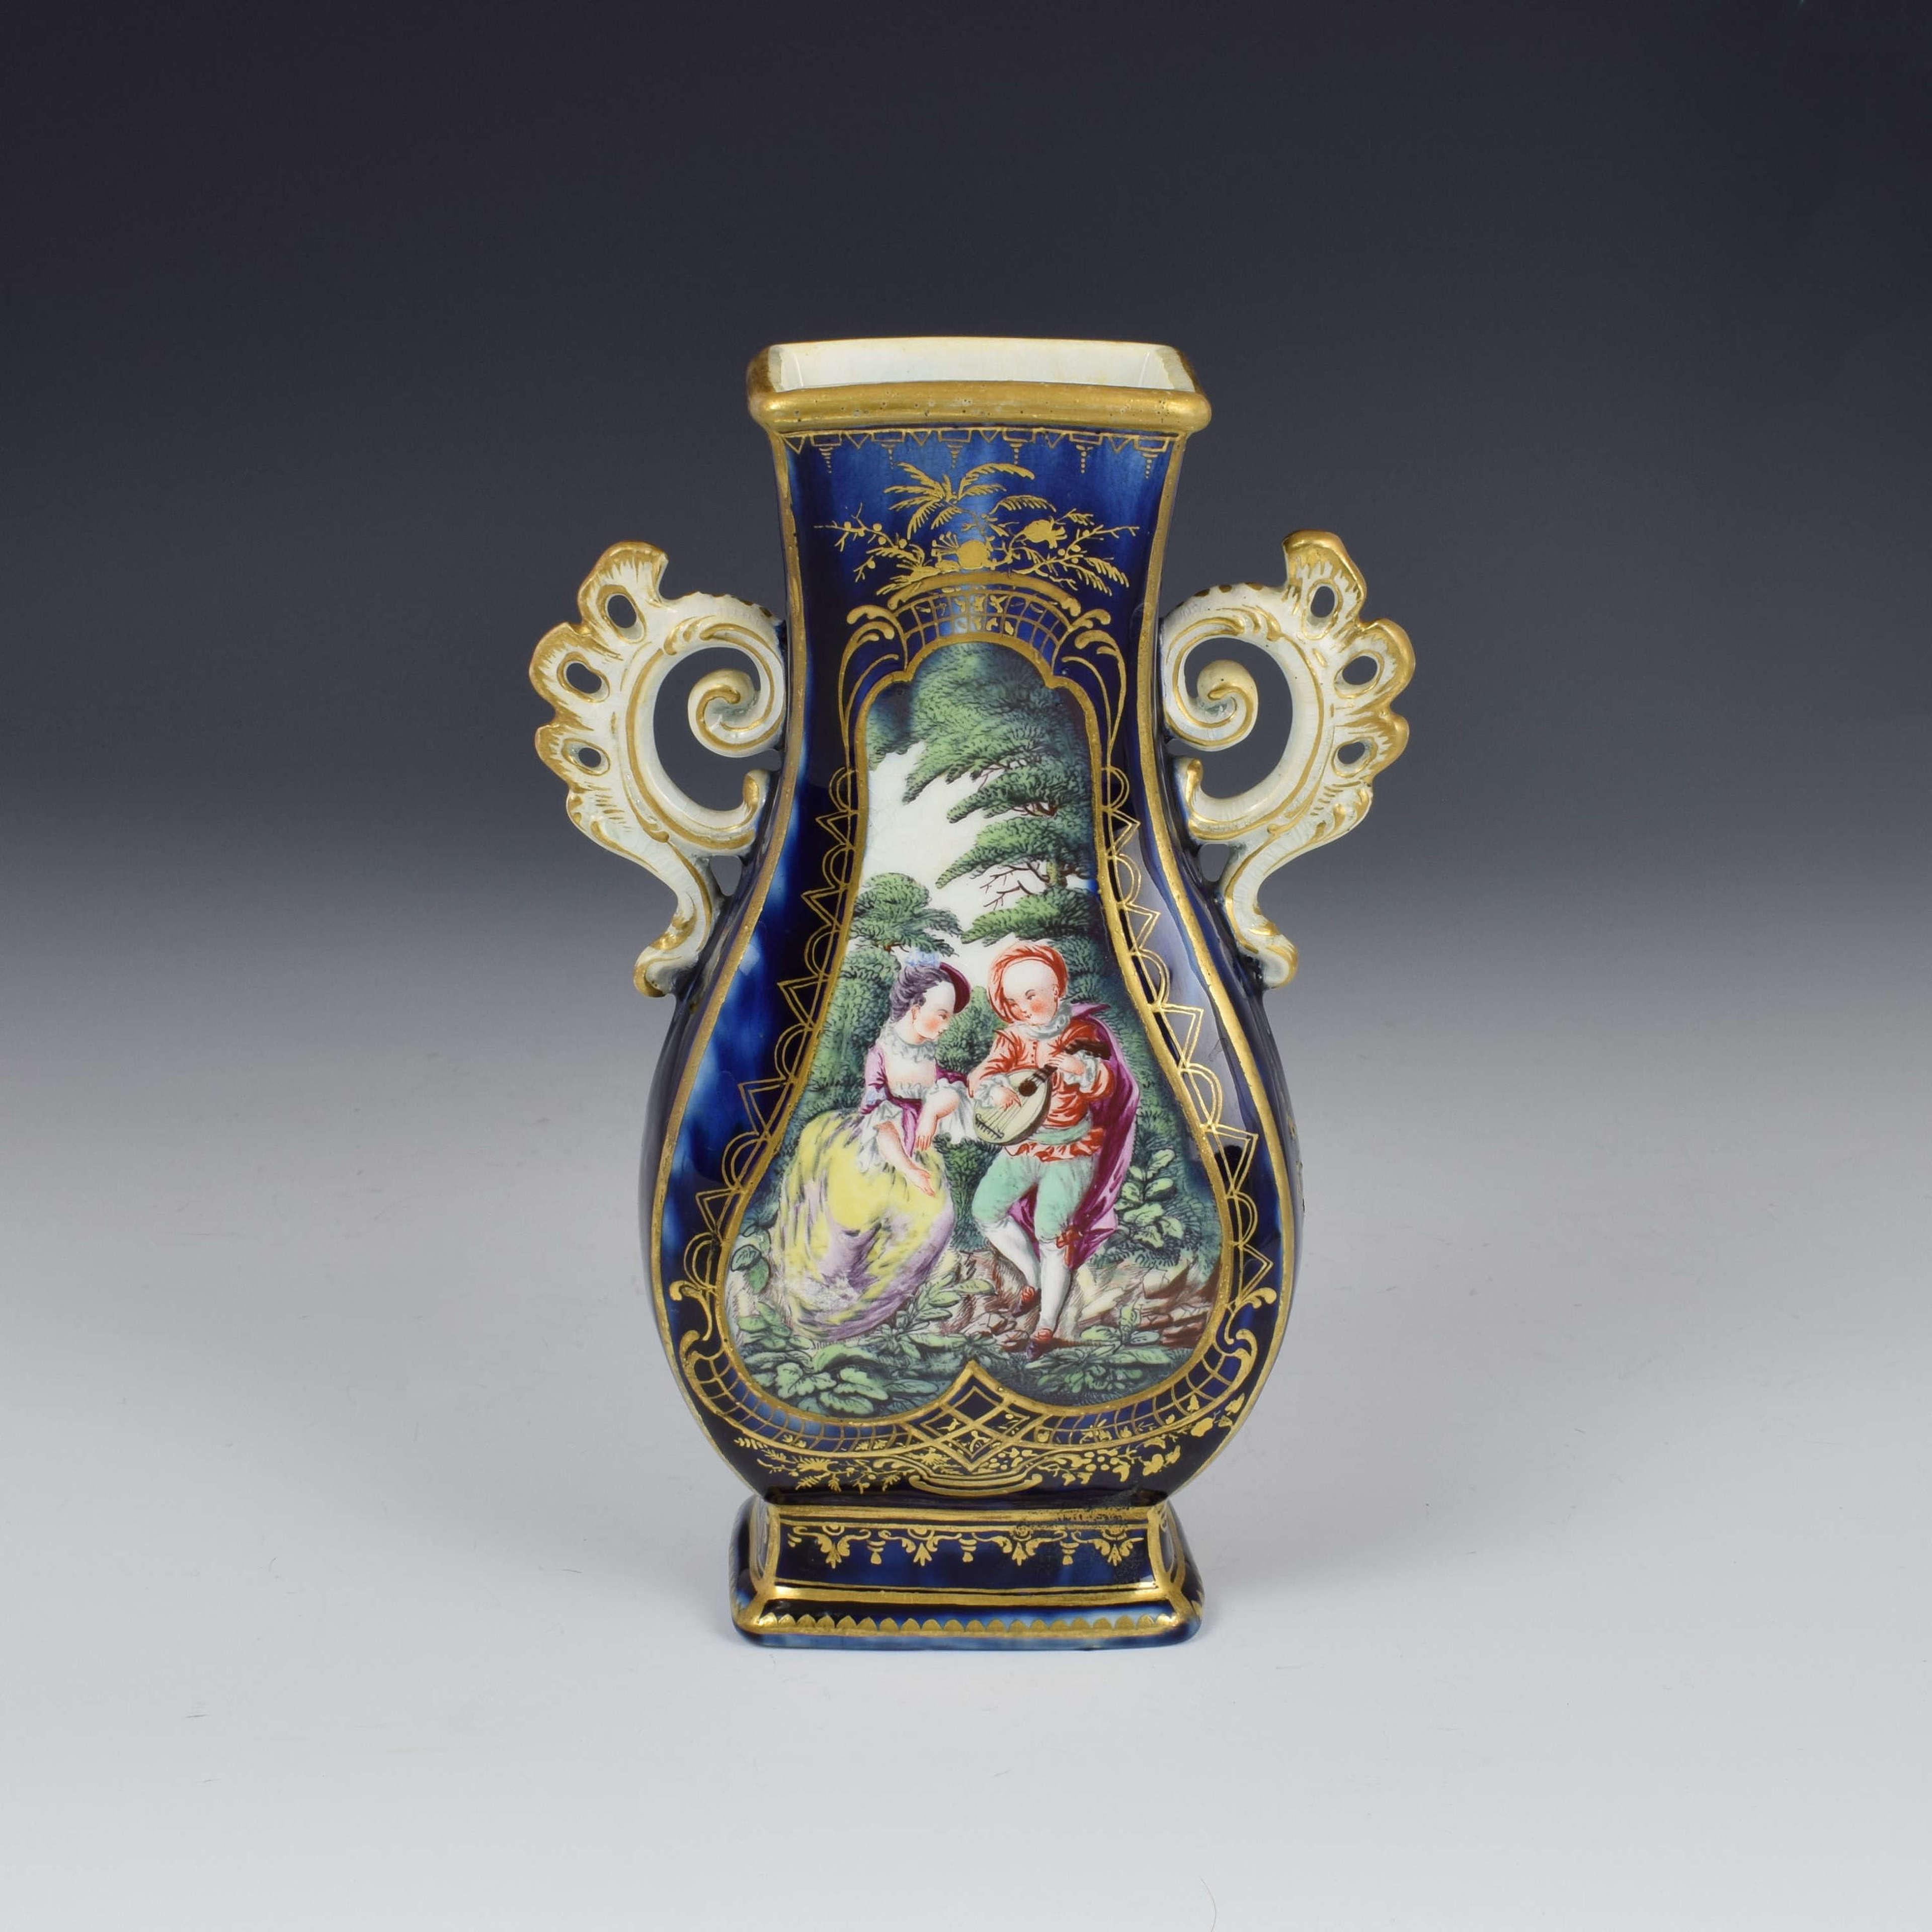 Chelsea Porcelain Gold Anchor Period Blue Ground Vase c.1765